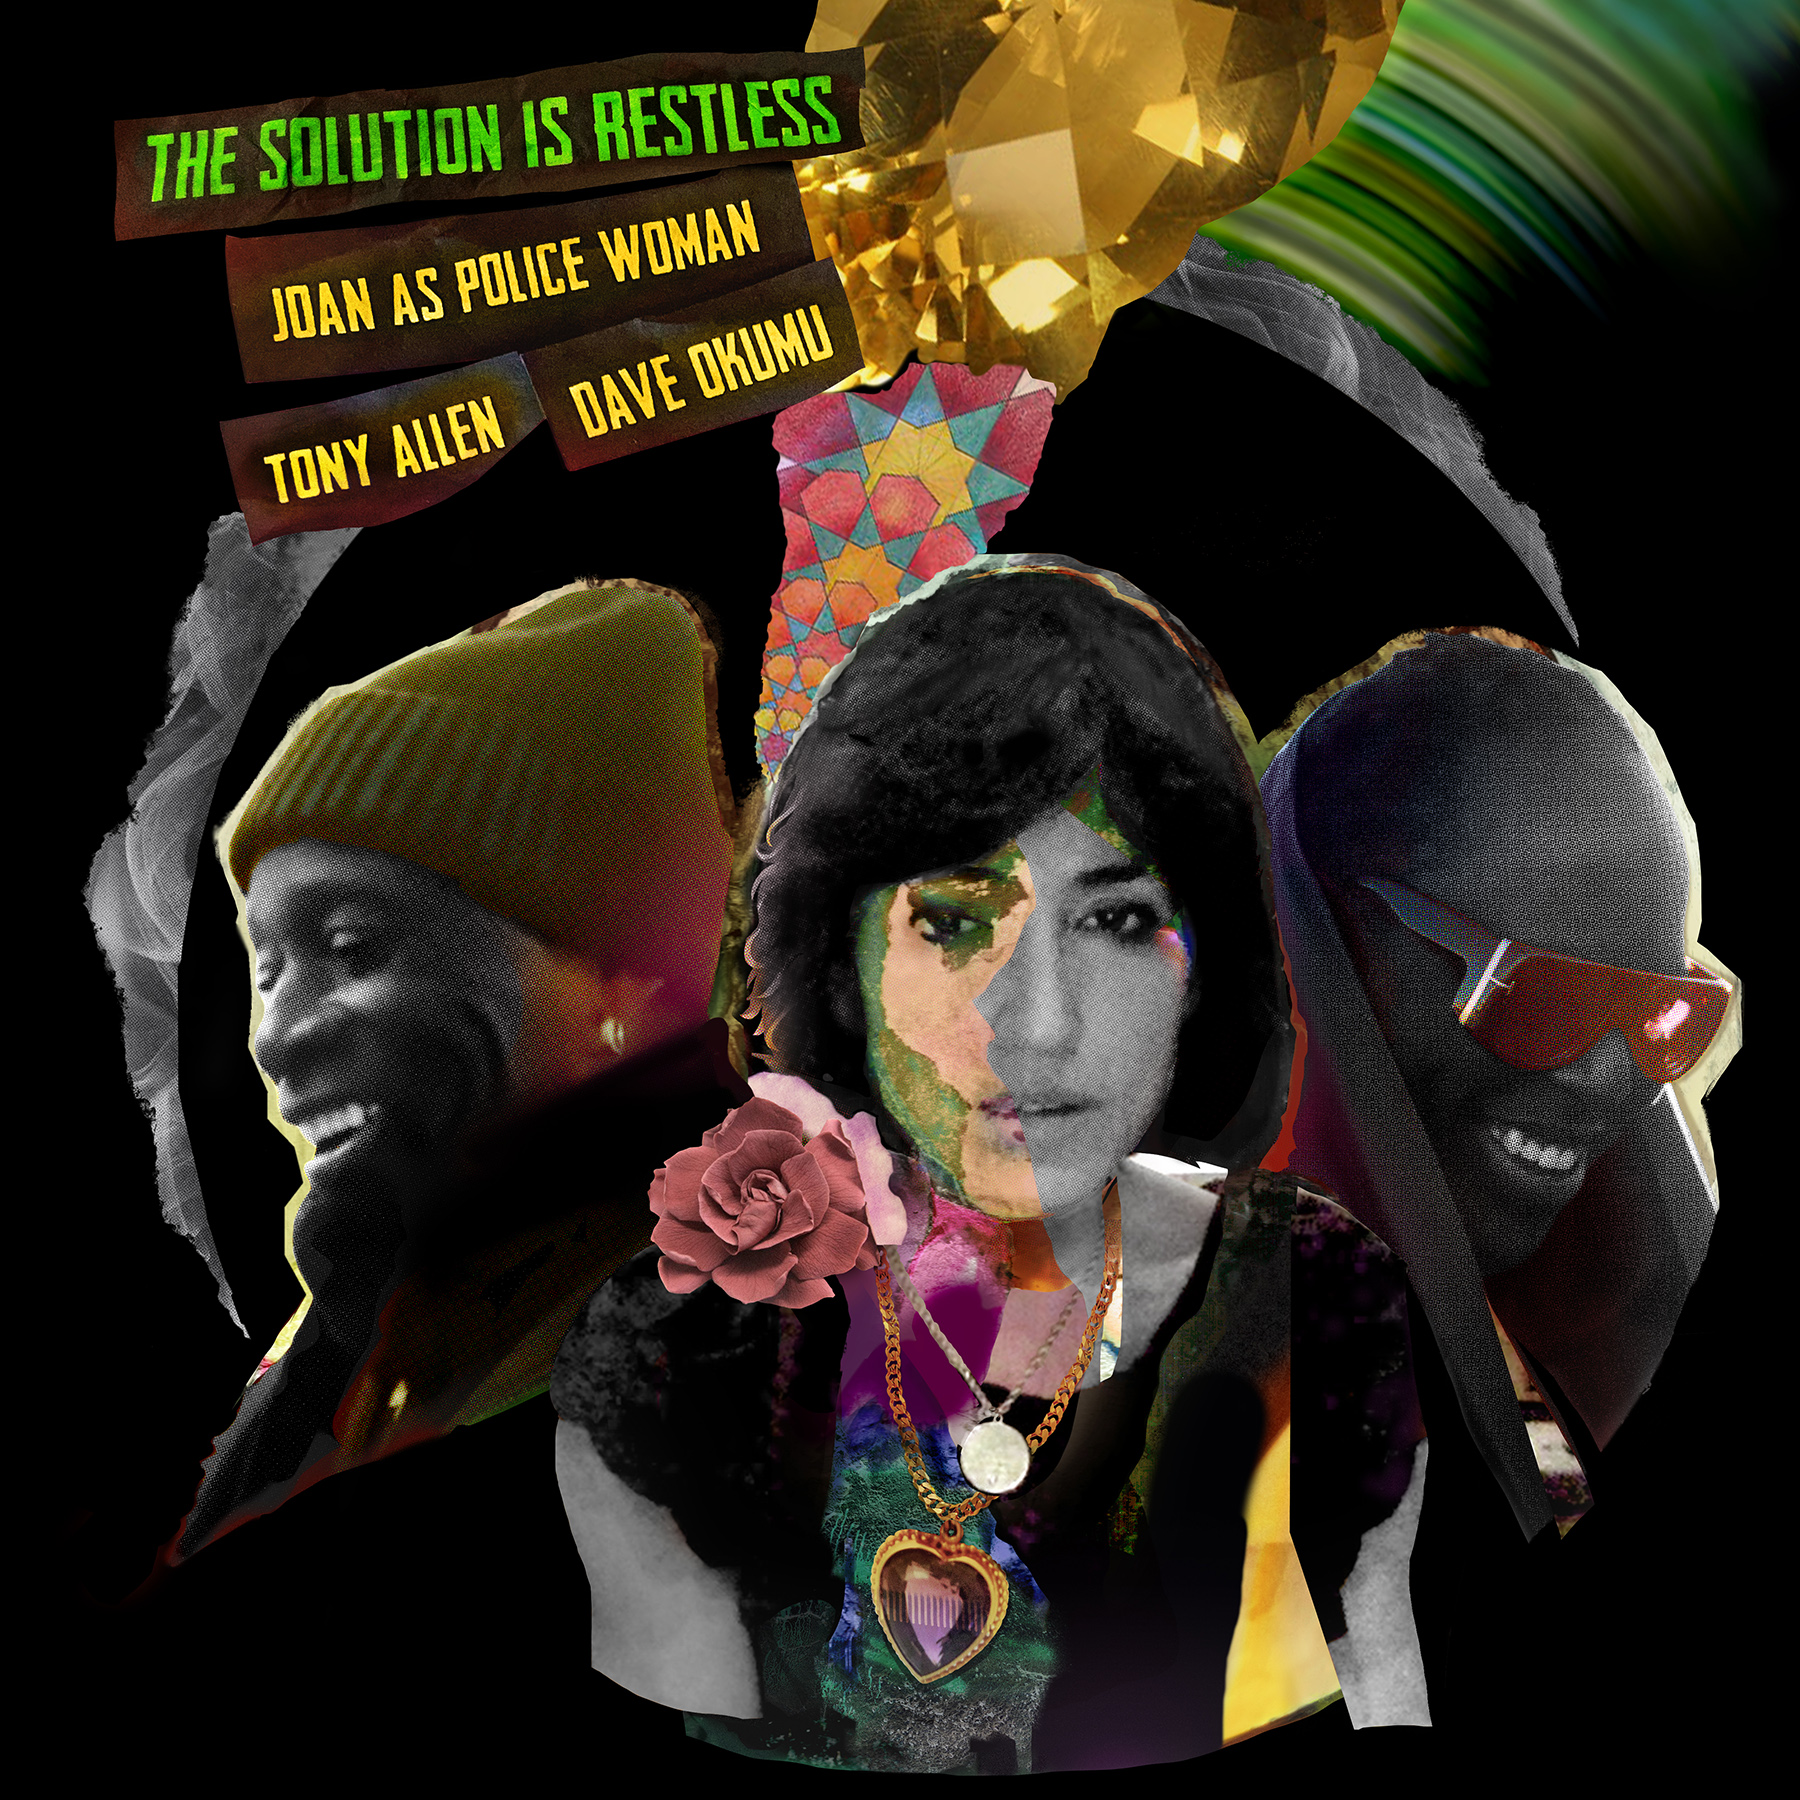 Joan as Police Woman, Dave Okumu, Tony Allen 'The Solution is Restless' album art